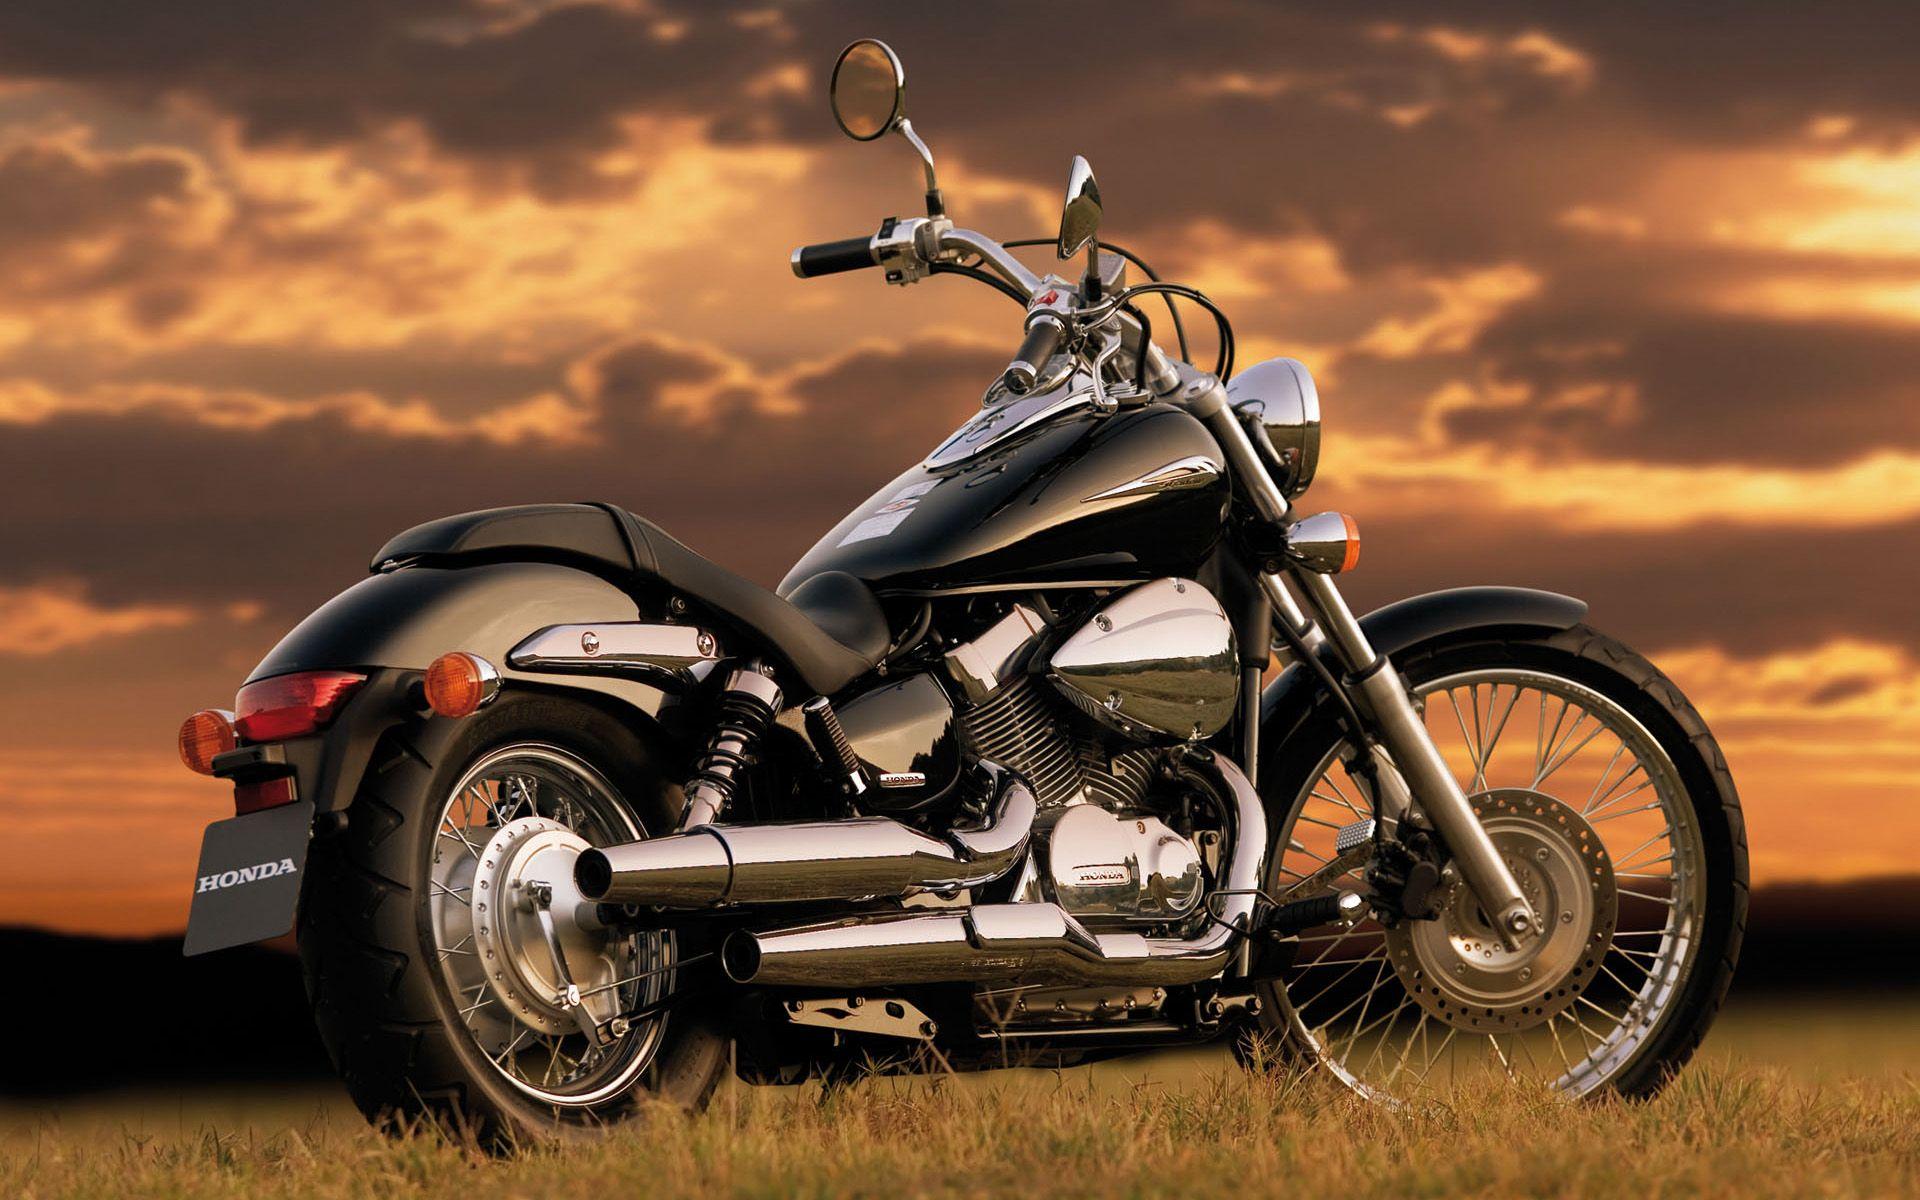 Honda Shadow Motorcycles Wallpaper Widescreen Wallpaper